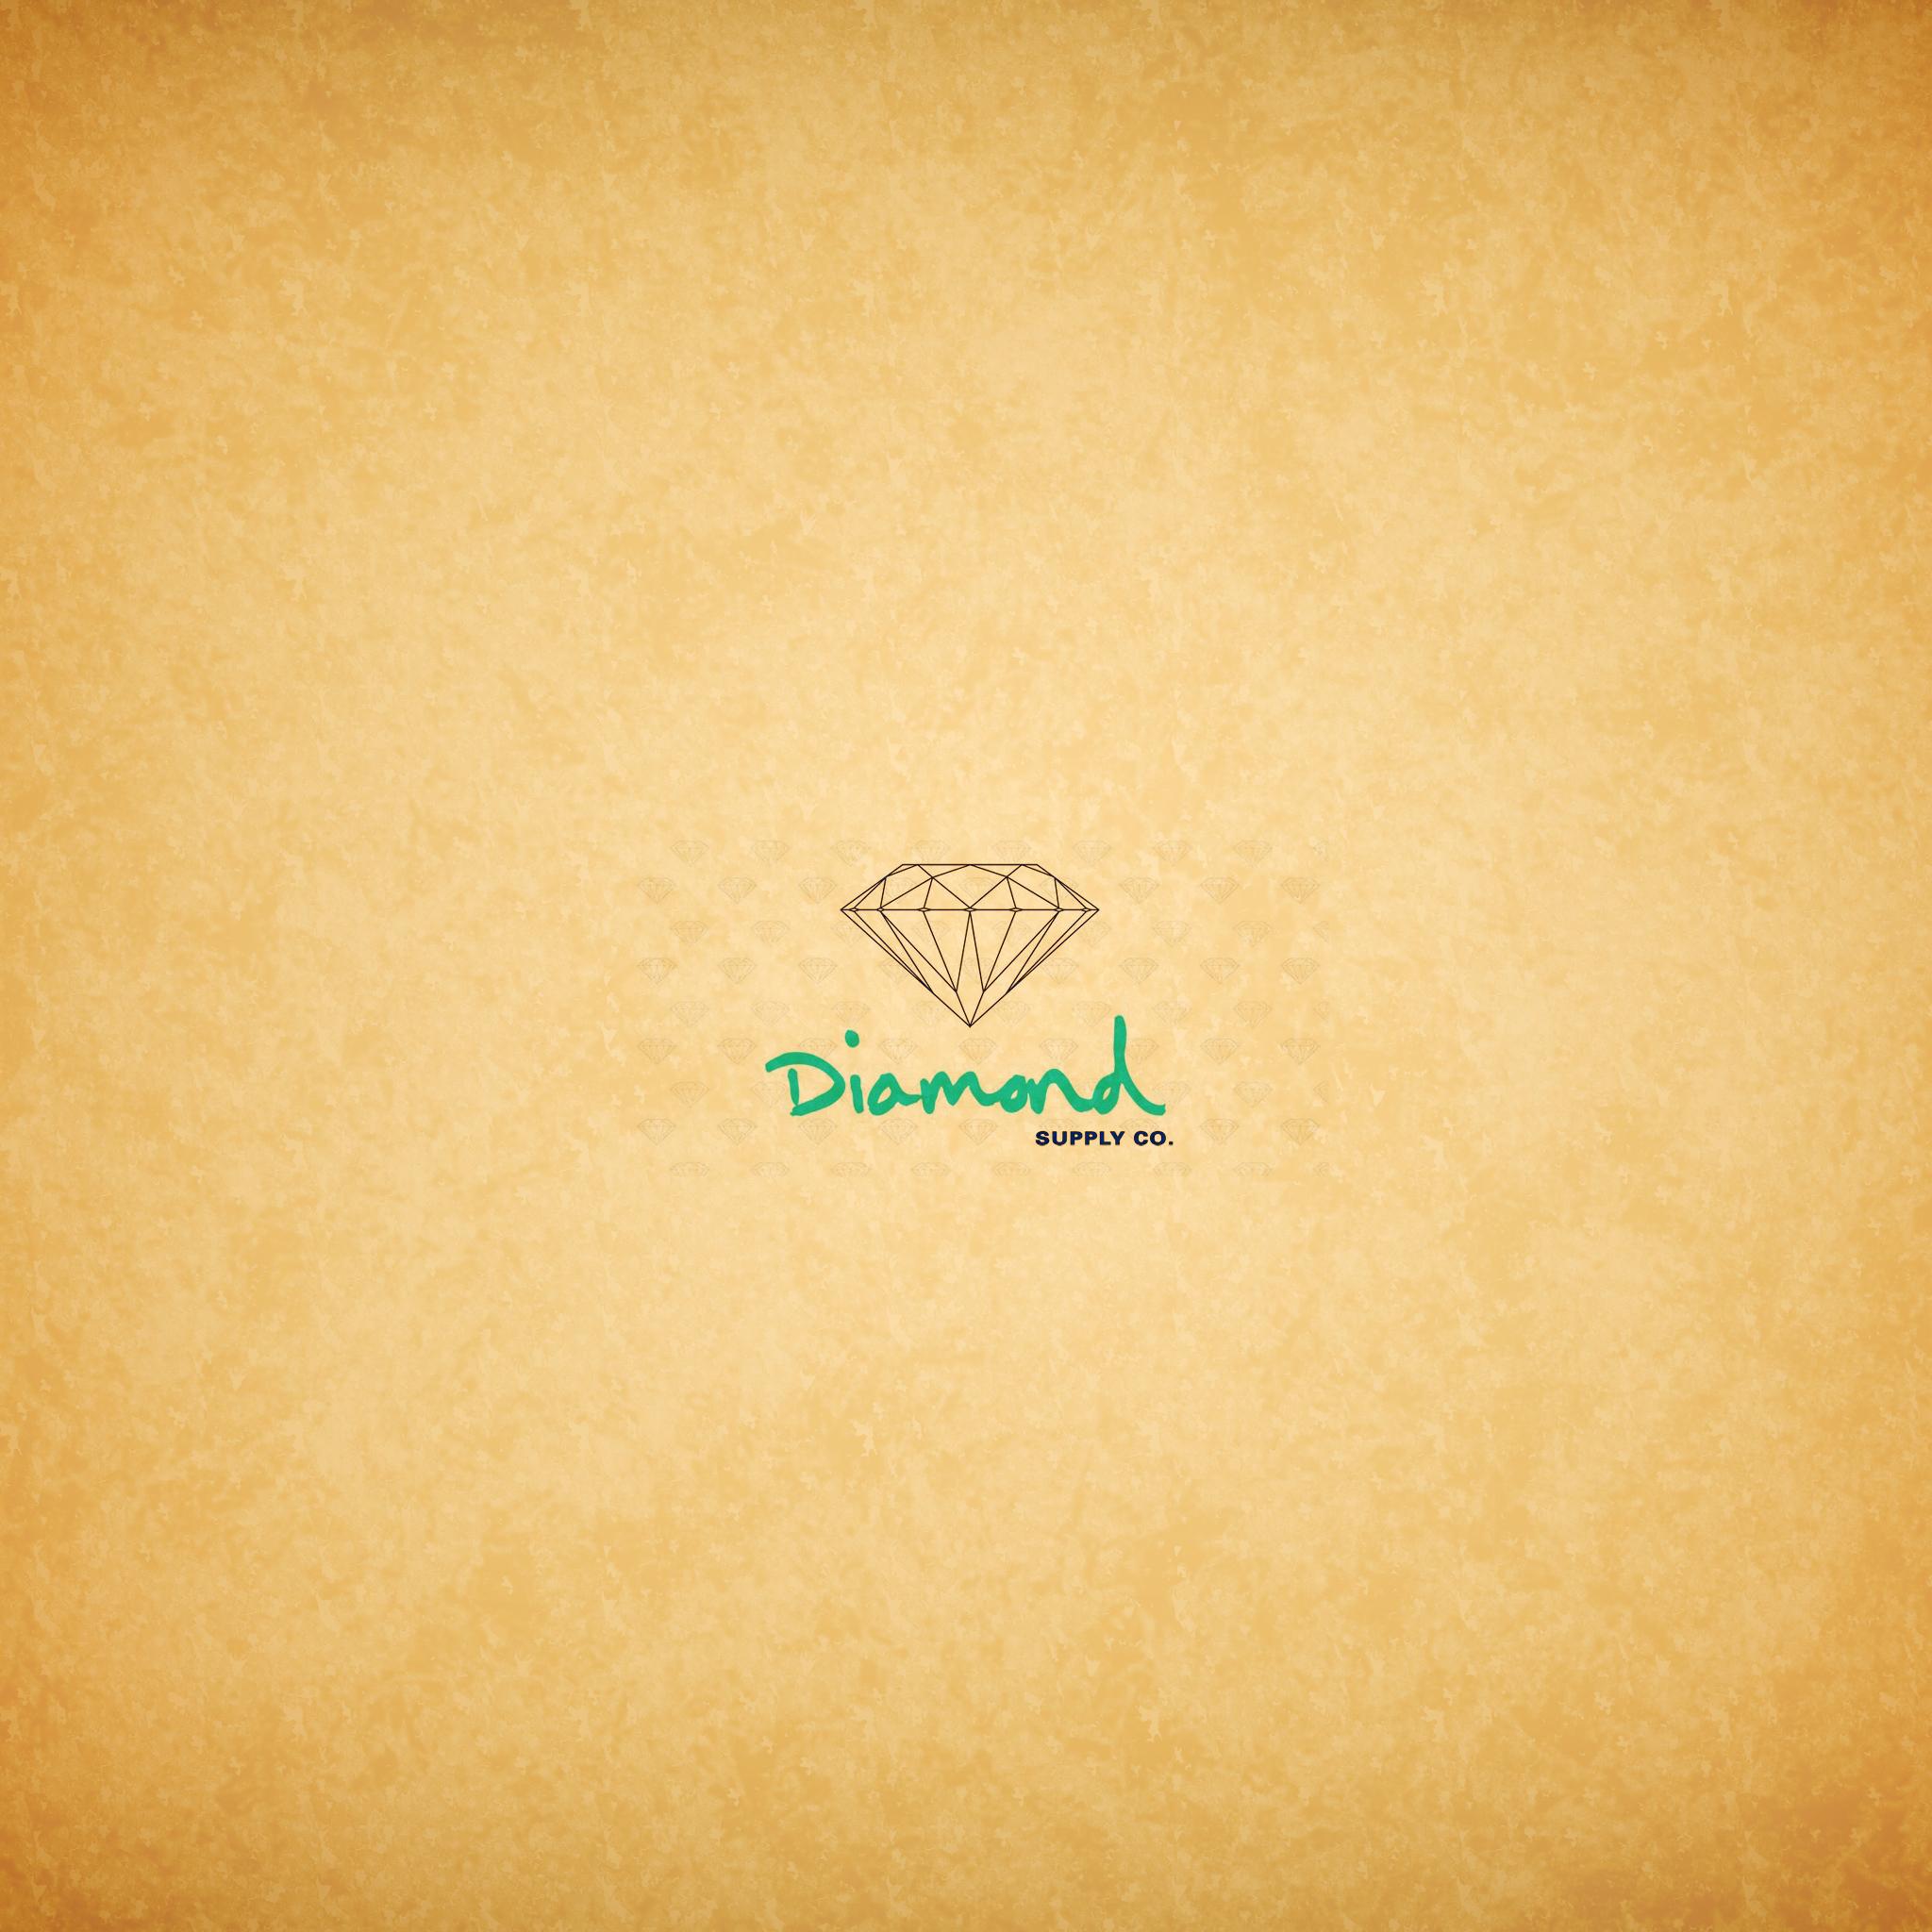 Diamond-Supply-Co-3Wallpapers-iPad